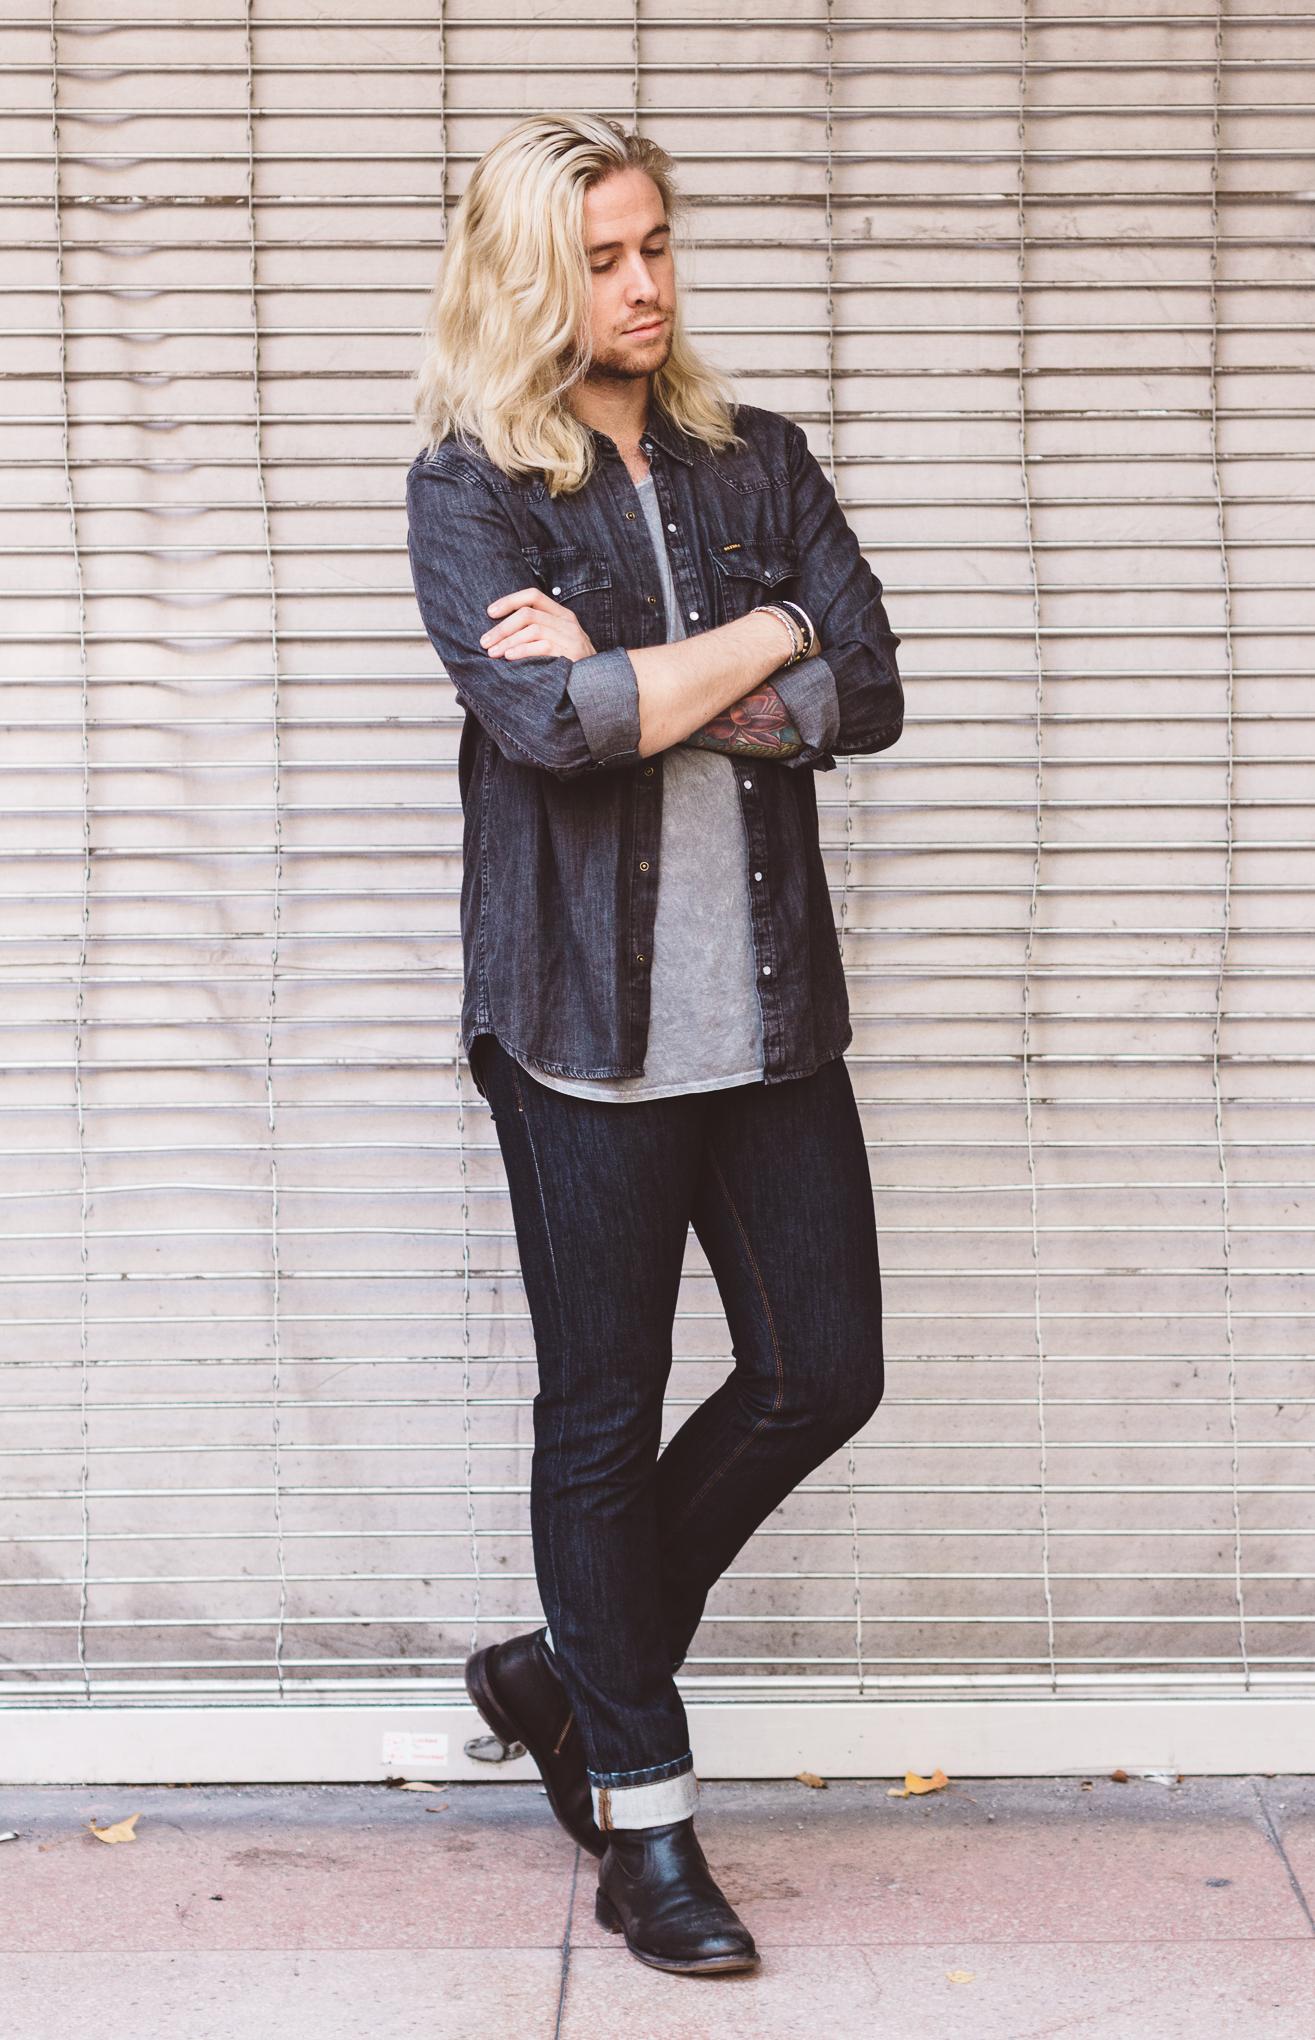 urban outfitters mens tshirts, big star denim, mens premium denim, platinum blonde mens hair, guys with long hair